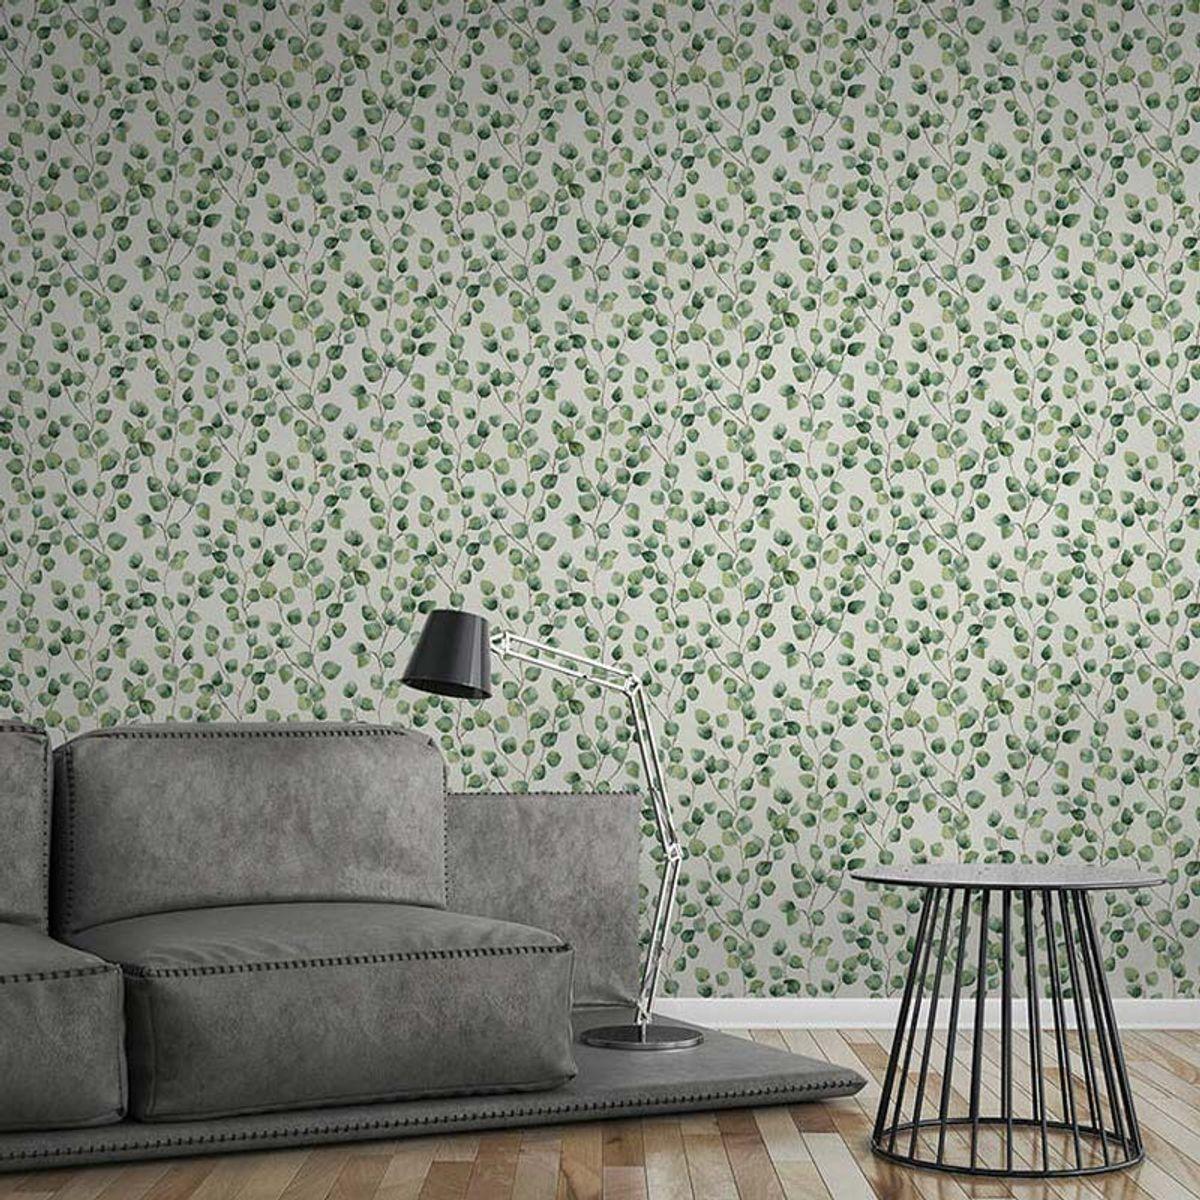 Papier peint vinyl intissé floral vert émeraude Worthing